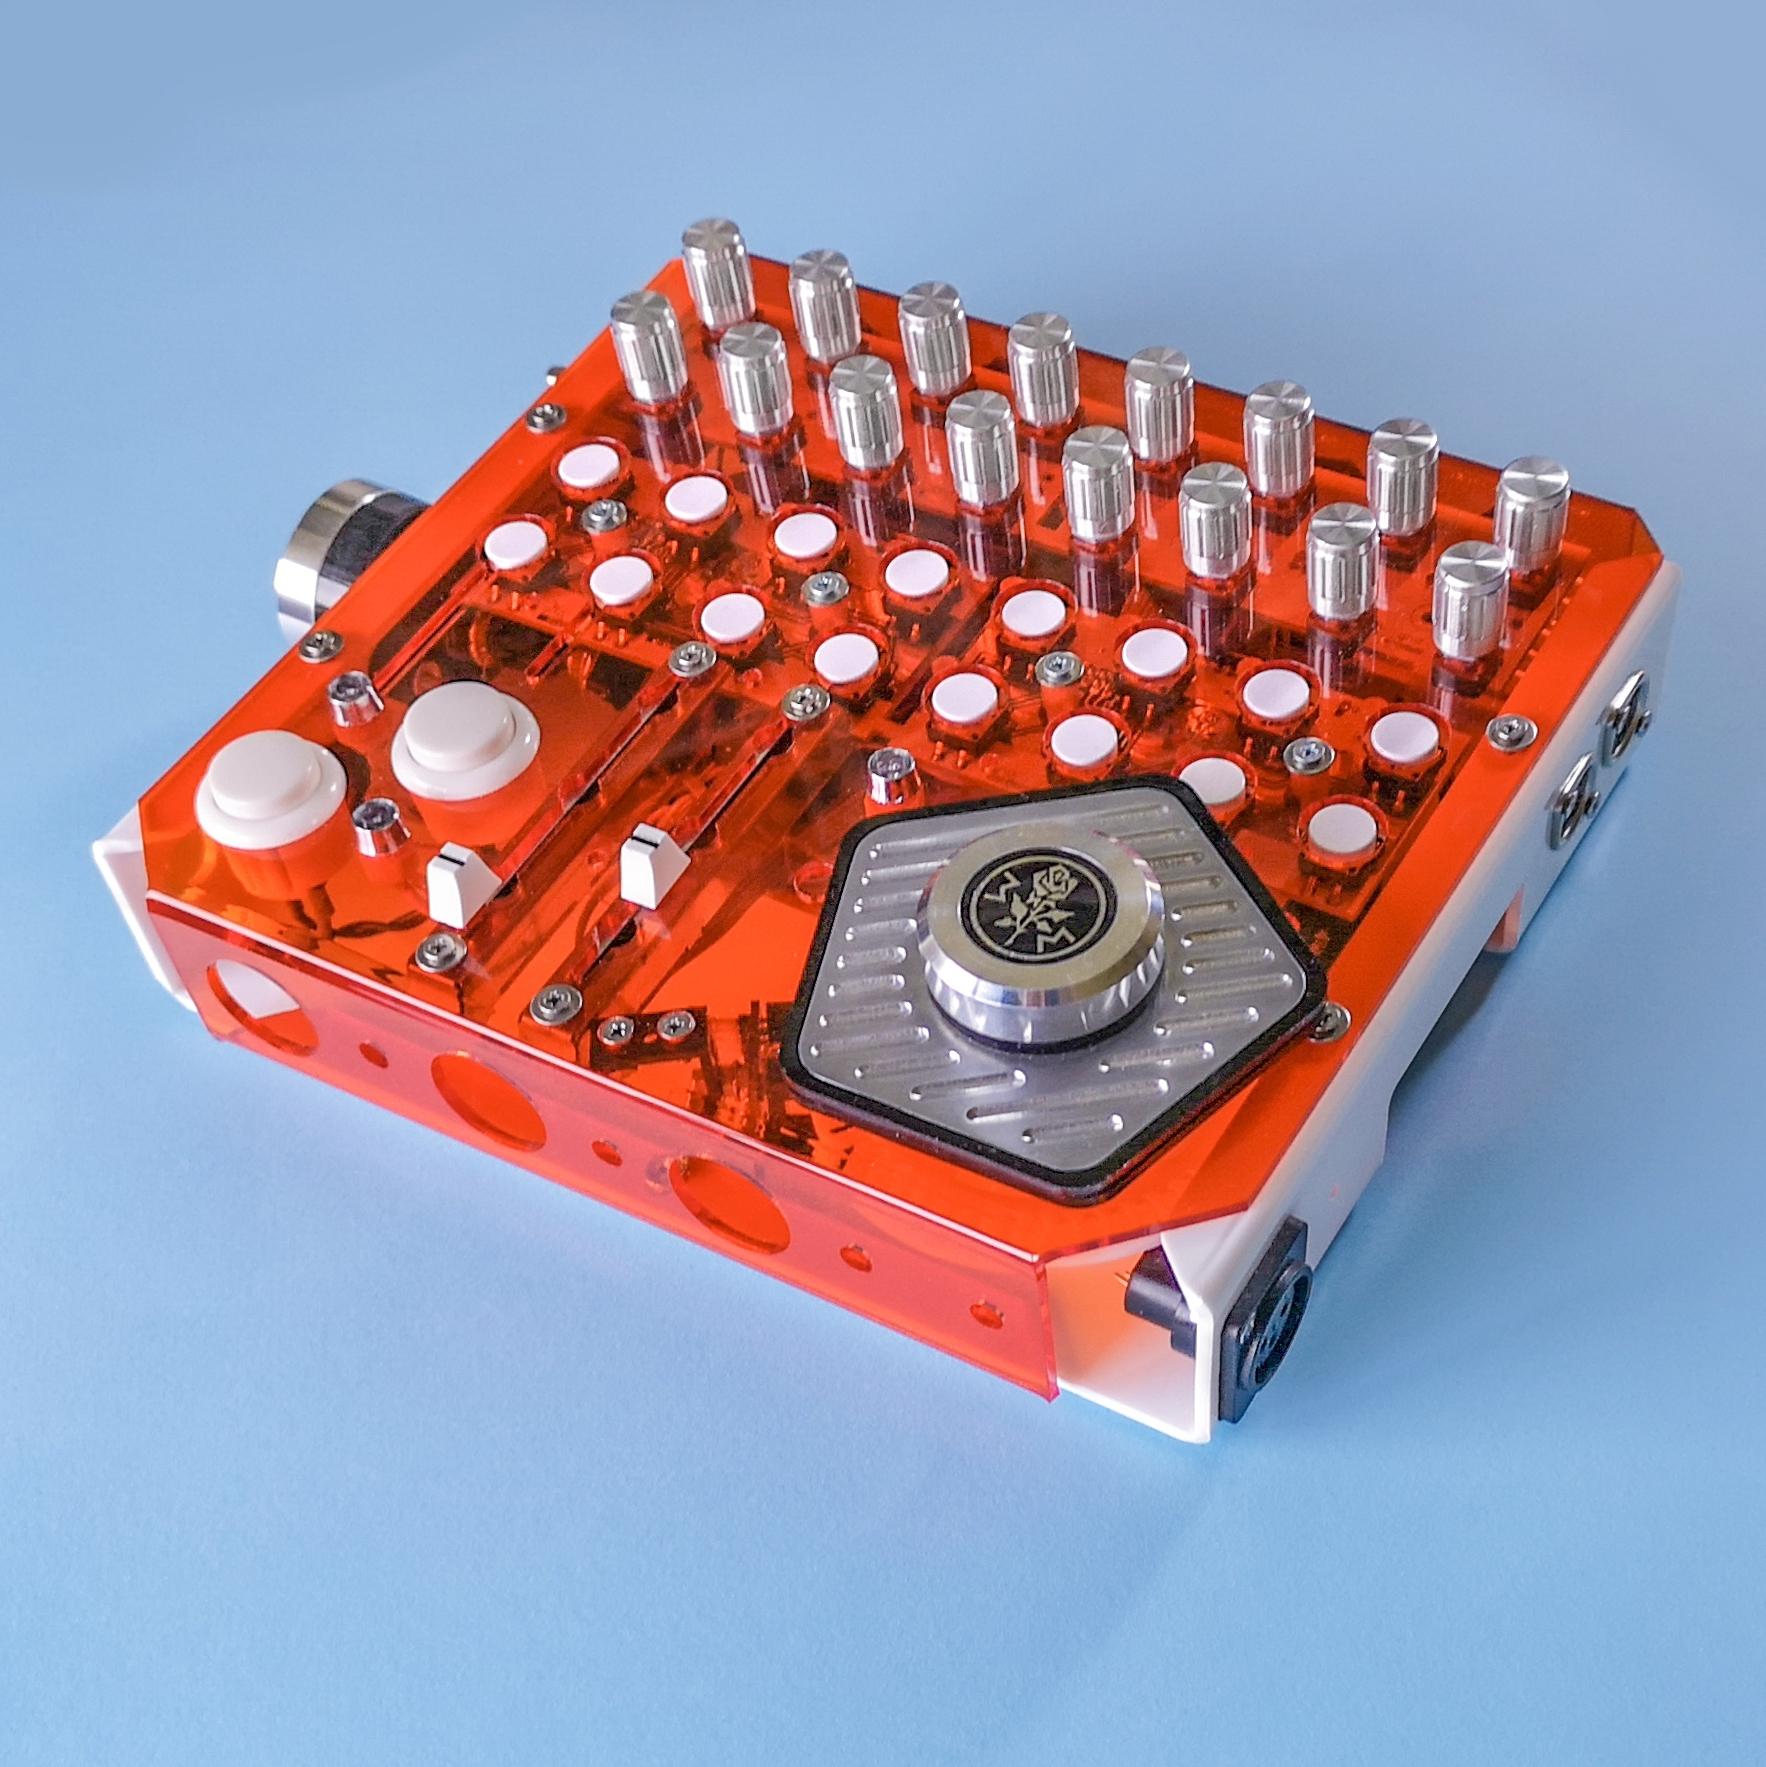 DART ONE MIDI DMX USB Arduino open dj controller DIY